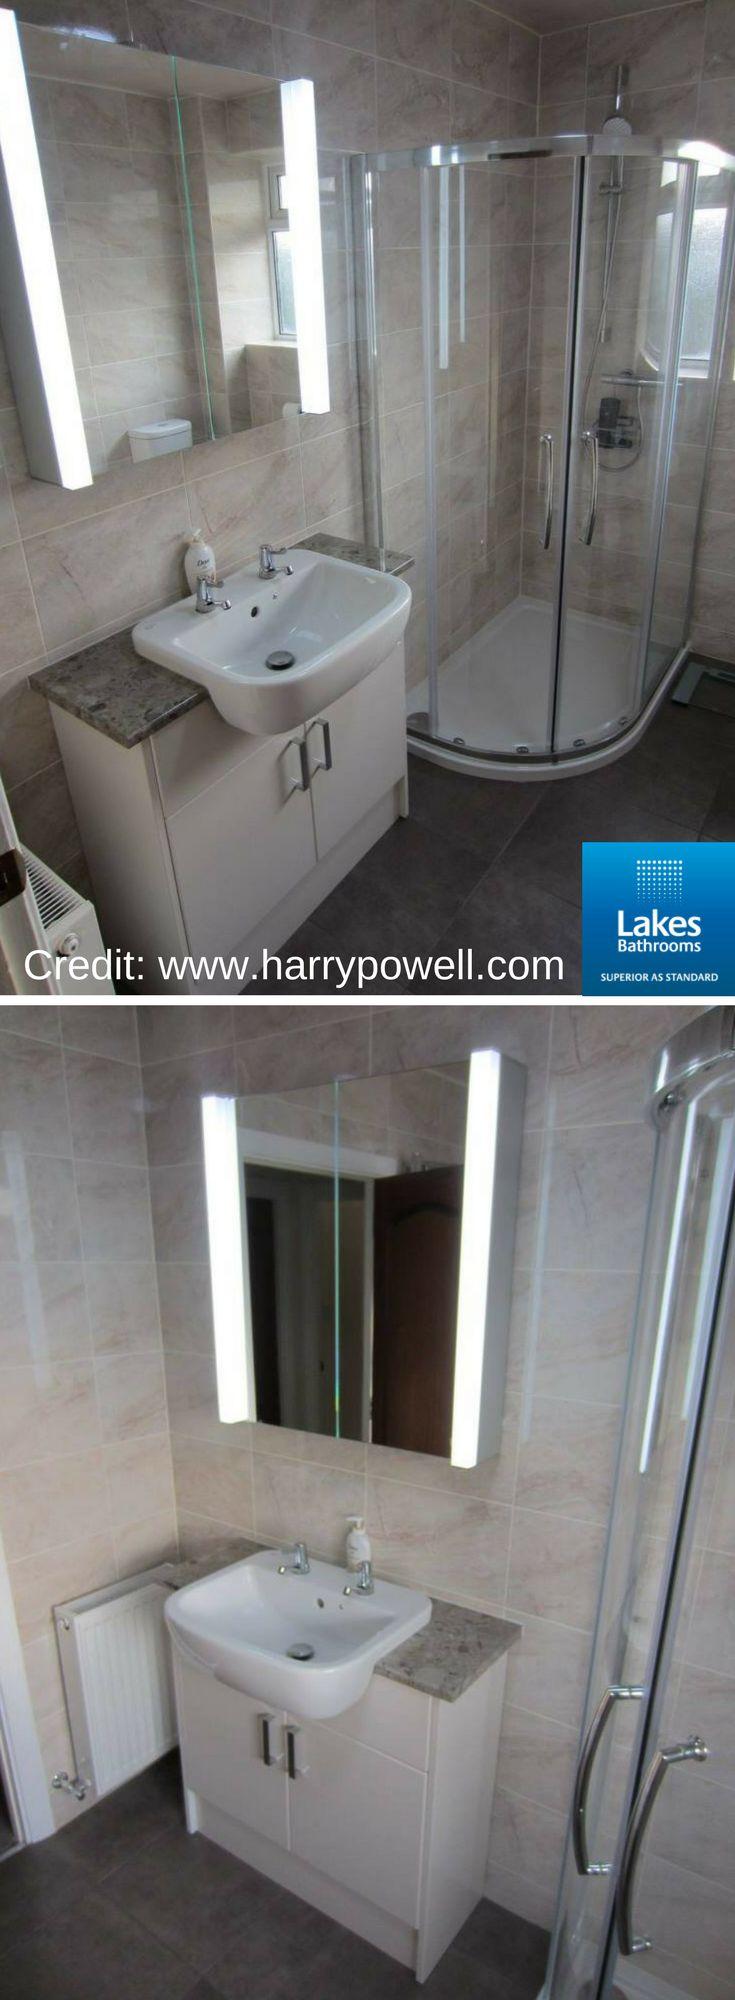 Great #bathroomremodel by Harry Powell (http://www.harrypowell.com/) featuring our Double Door Offset Quadrant. #RealLakesBathroooms #BathroomDesign #BathroomIdeas